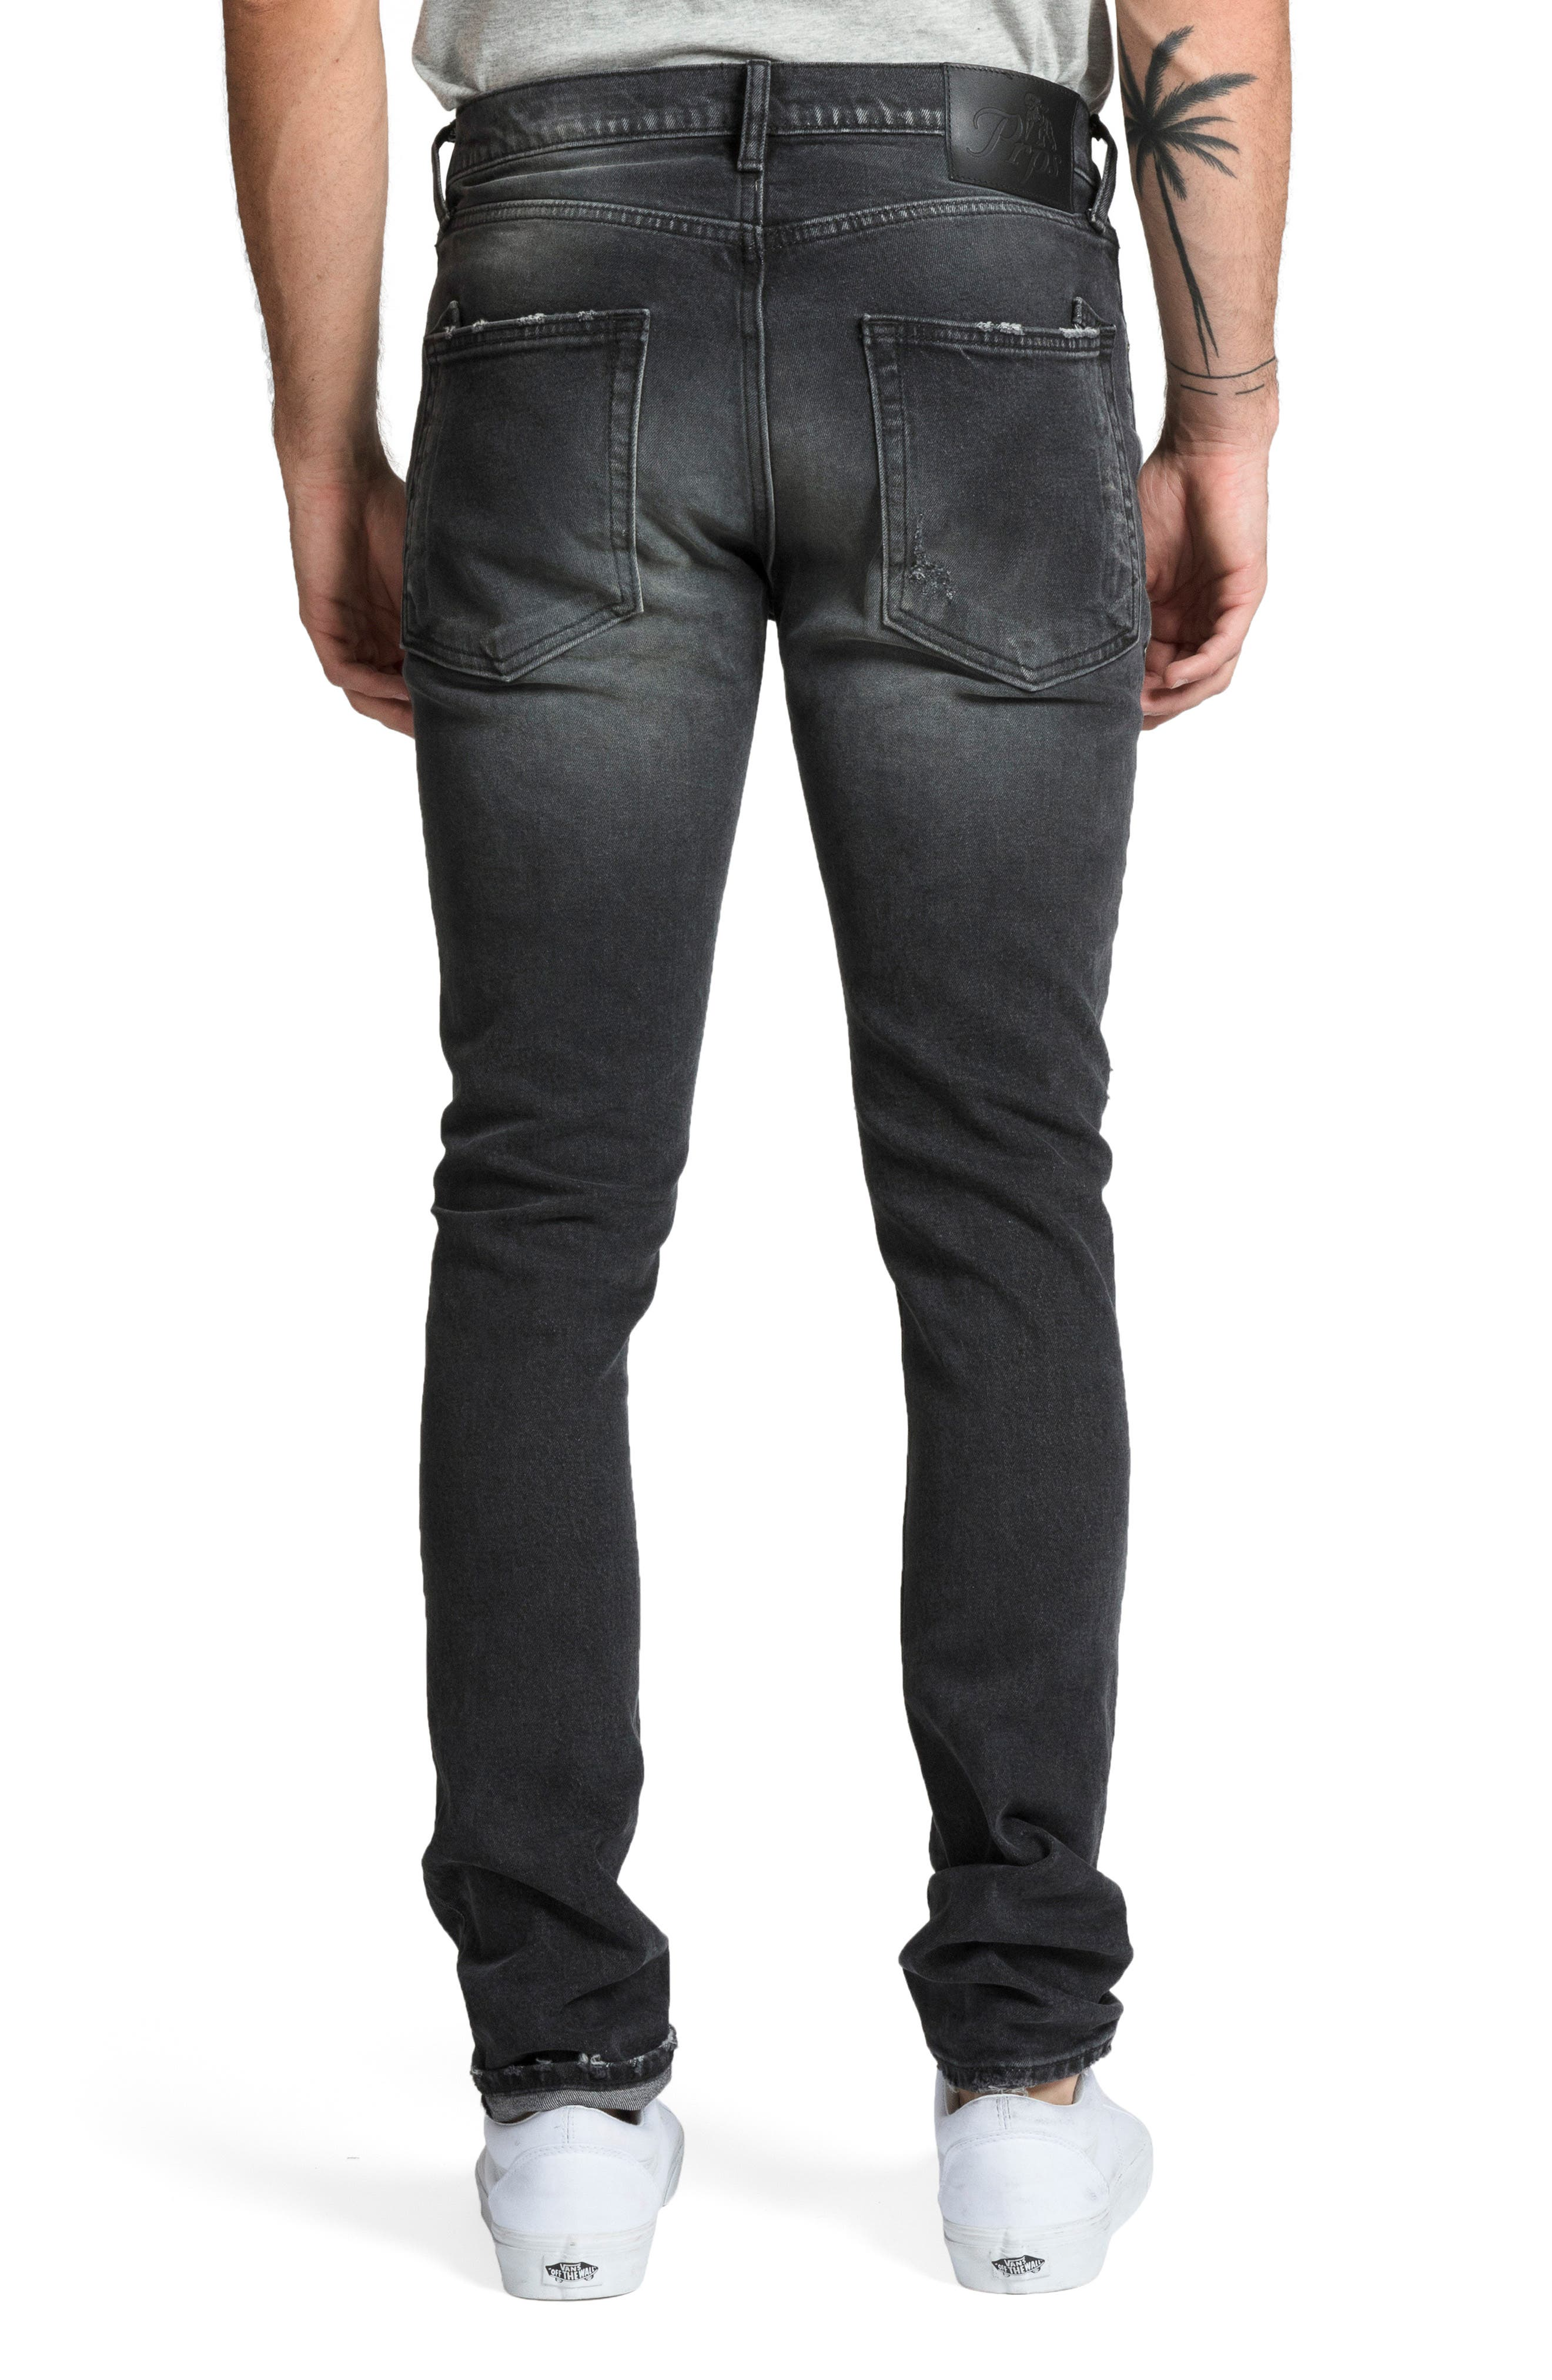 Windsor Skinny Fit Jeans,                             Alternate thumbnail 2, color,                             RESOLUTE